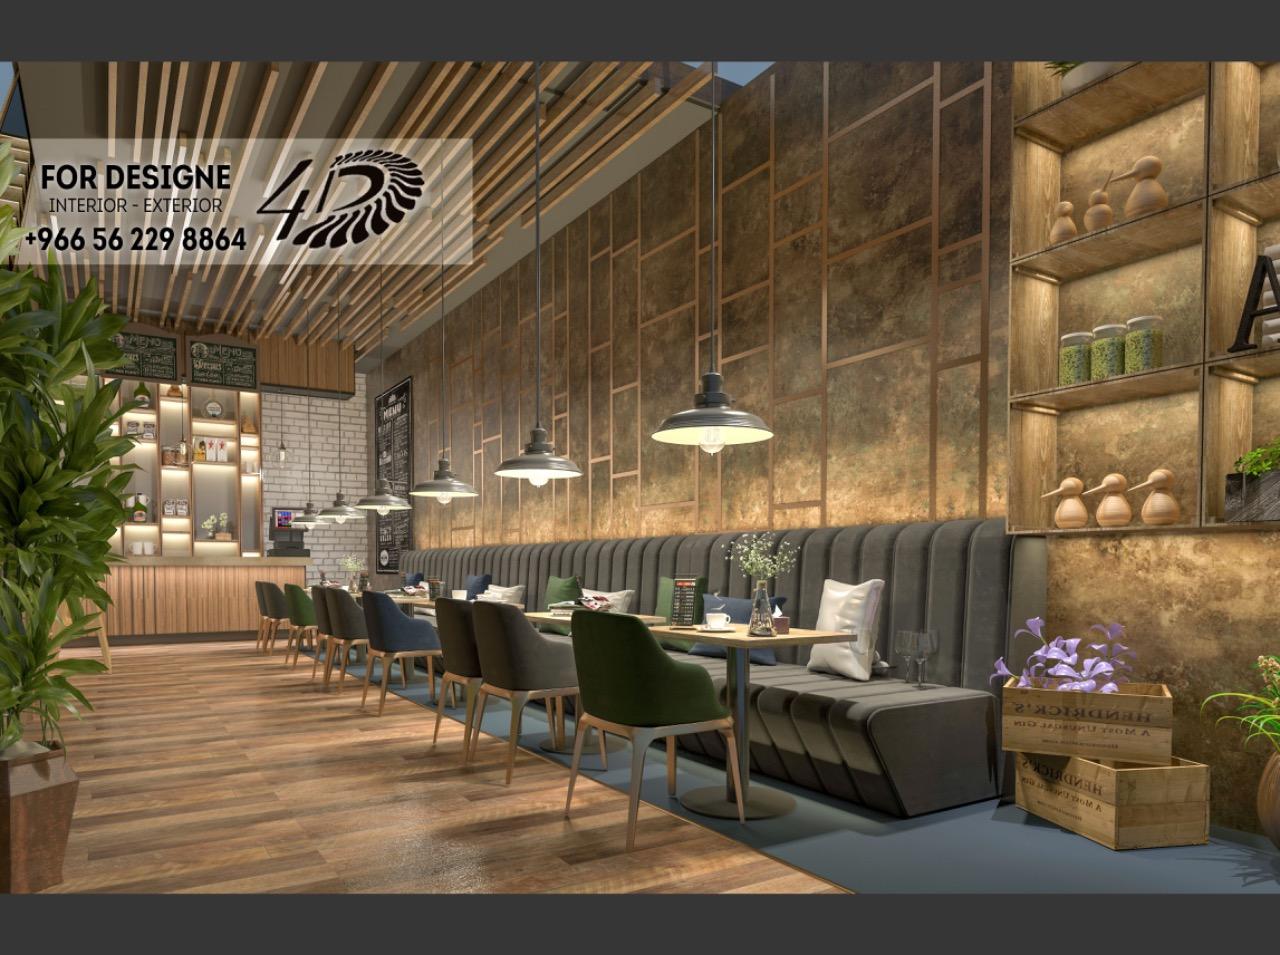 Tمصمم مطاعم بالرياض 0562298864 مصمم p_156263q607.jpg